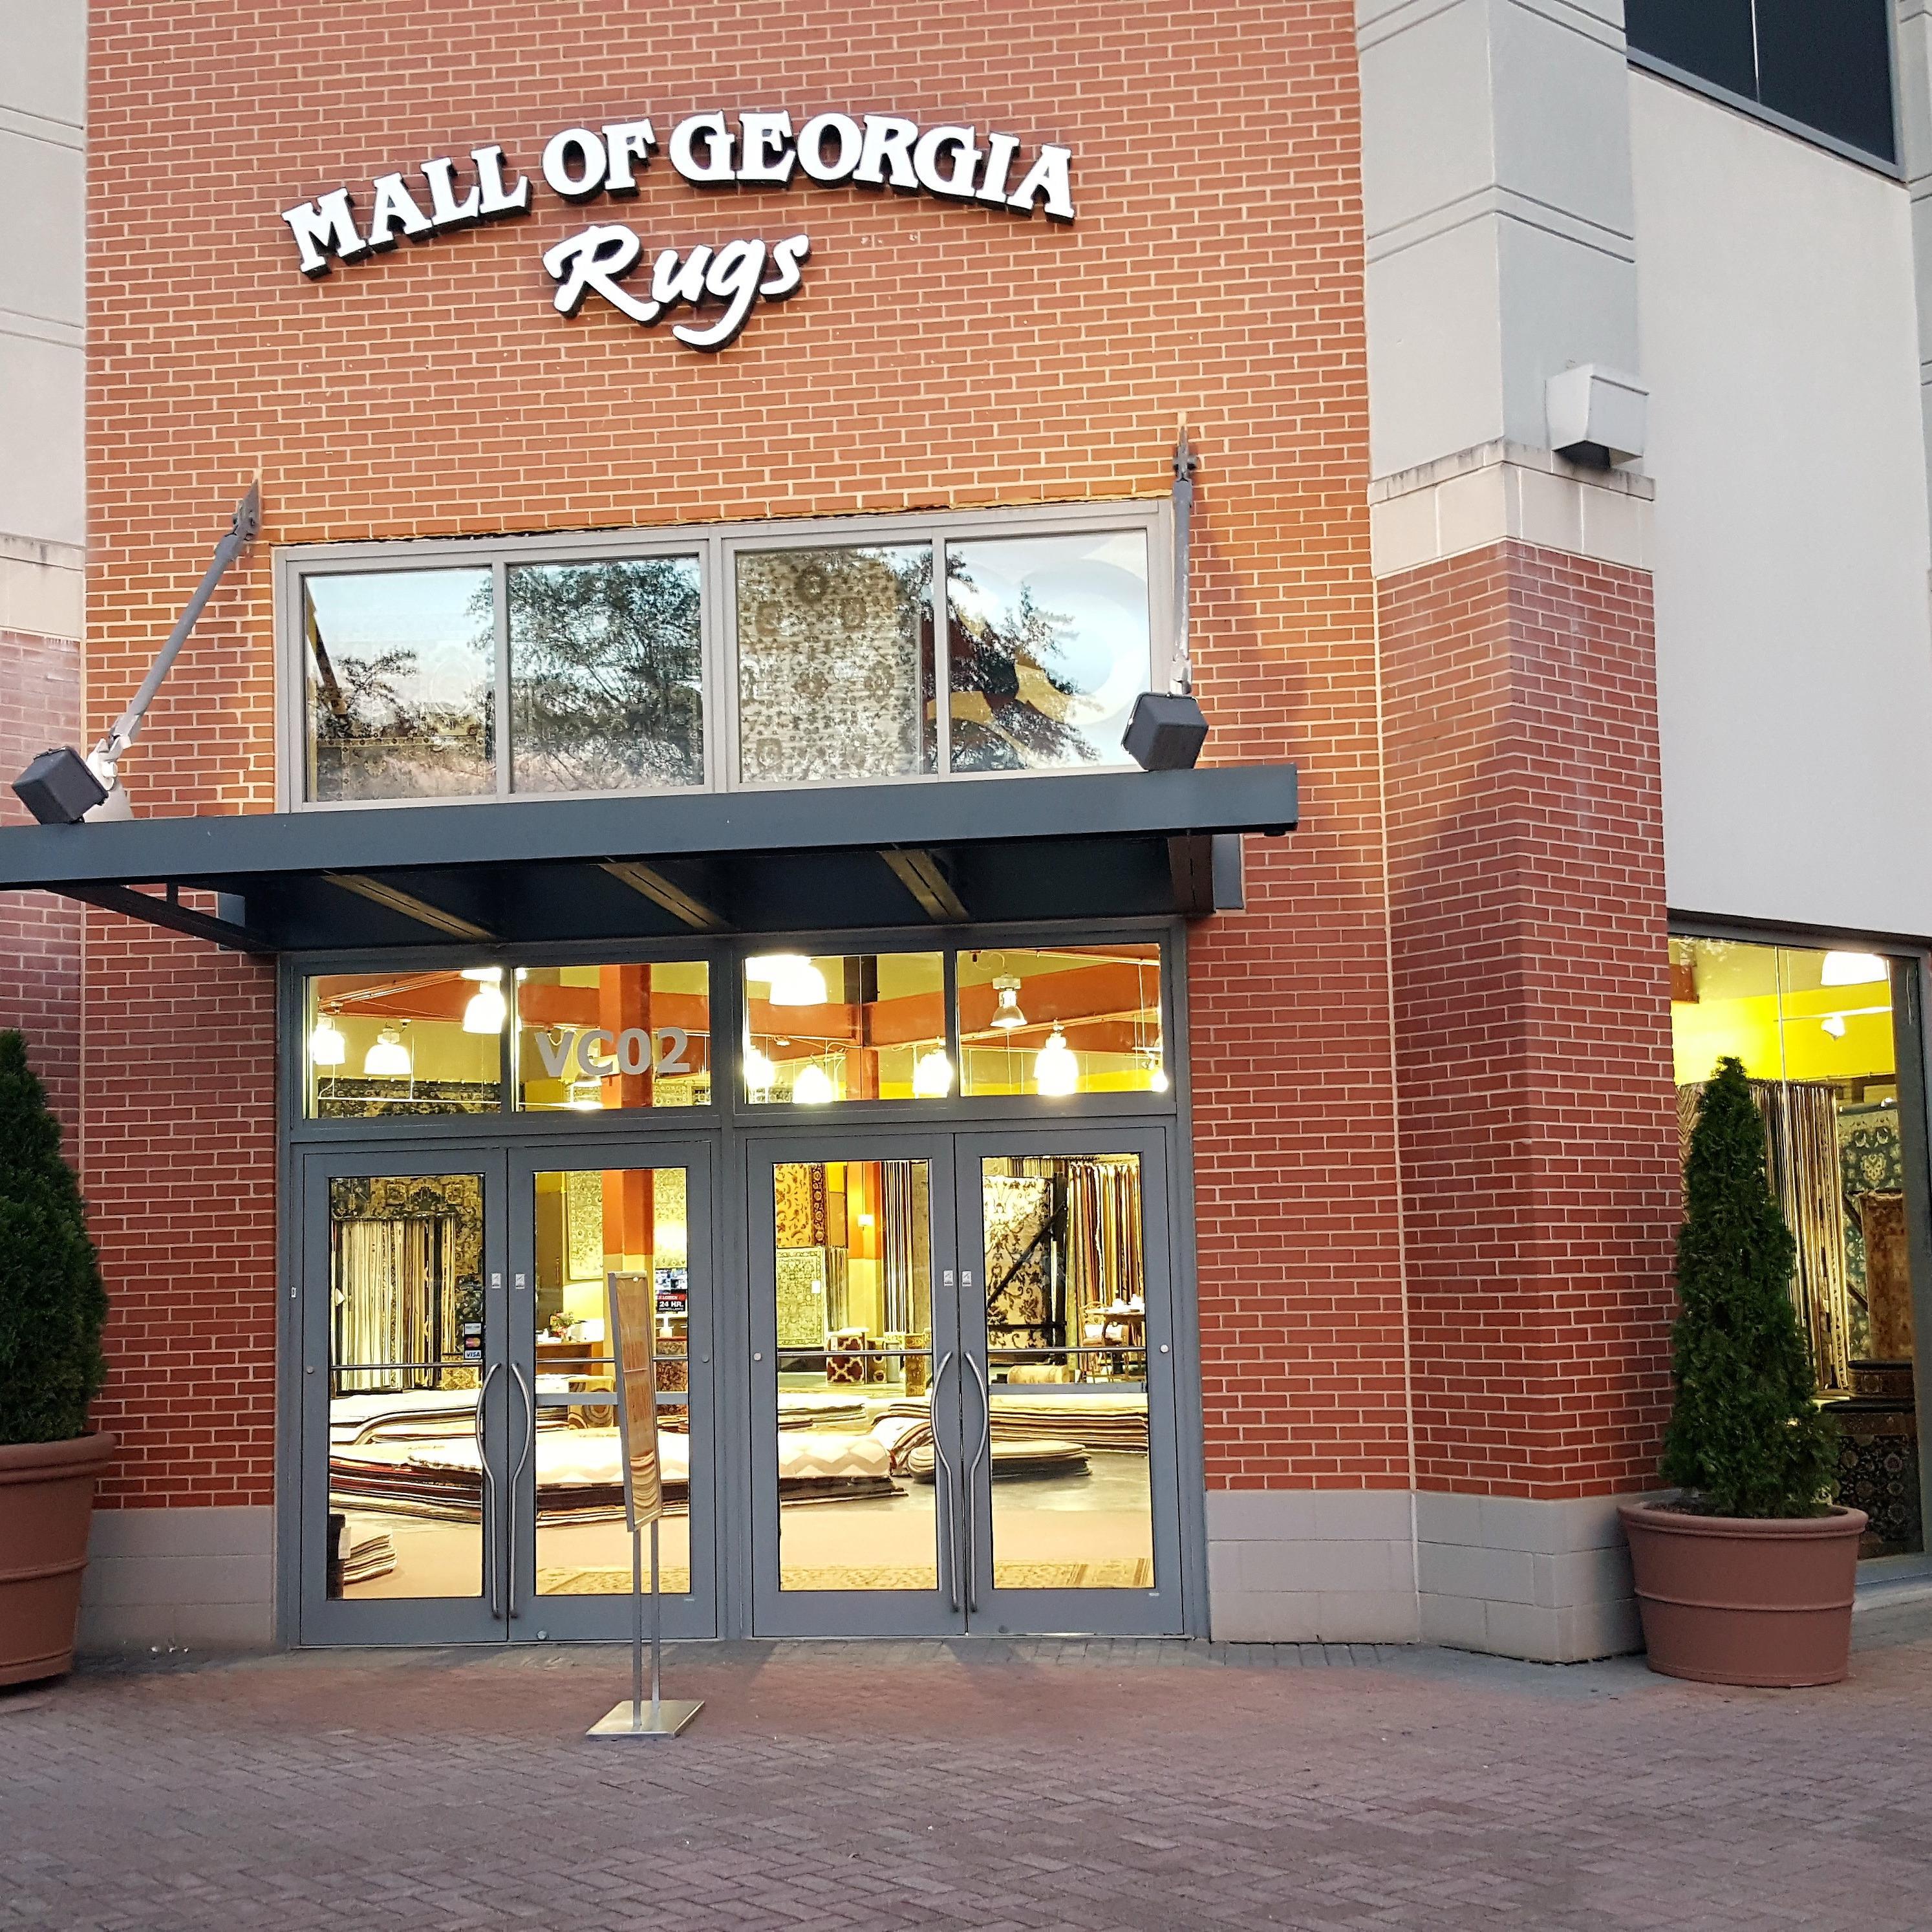 Mall of Georgia Rugs Carpet Store Buford GA